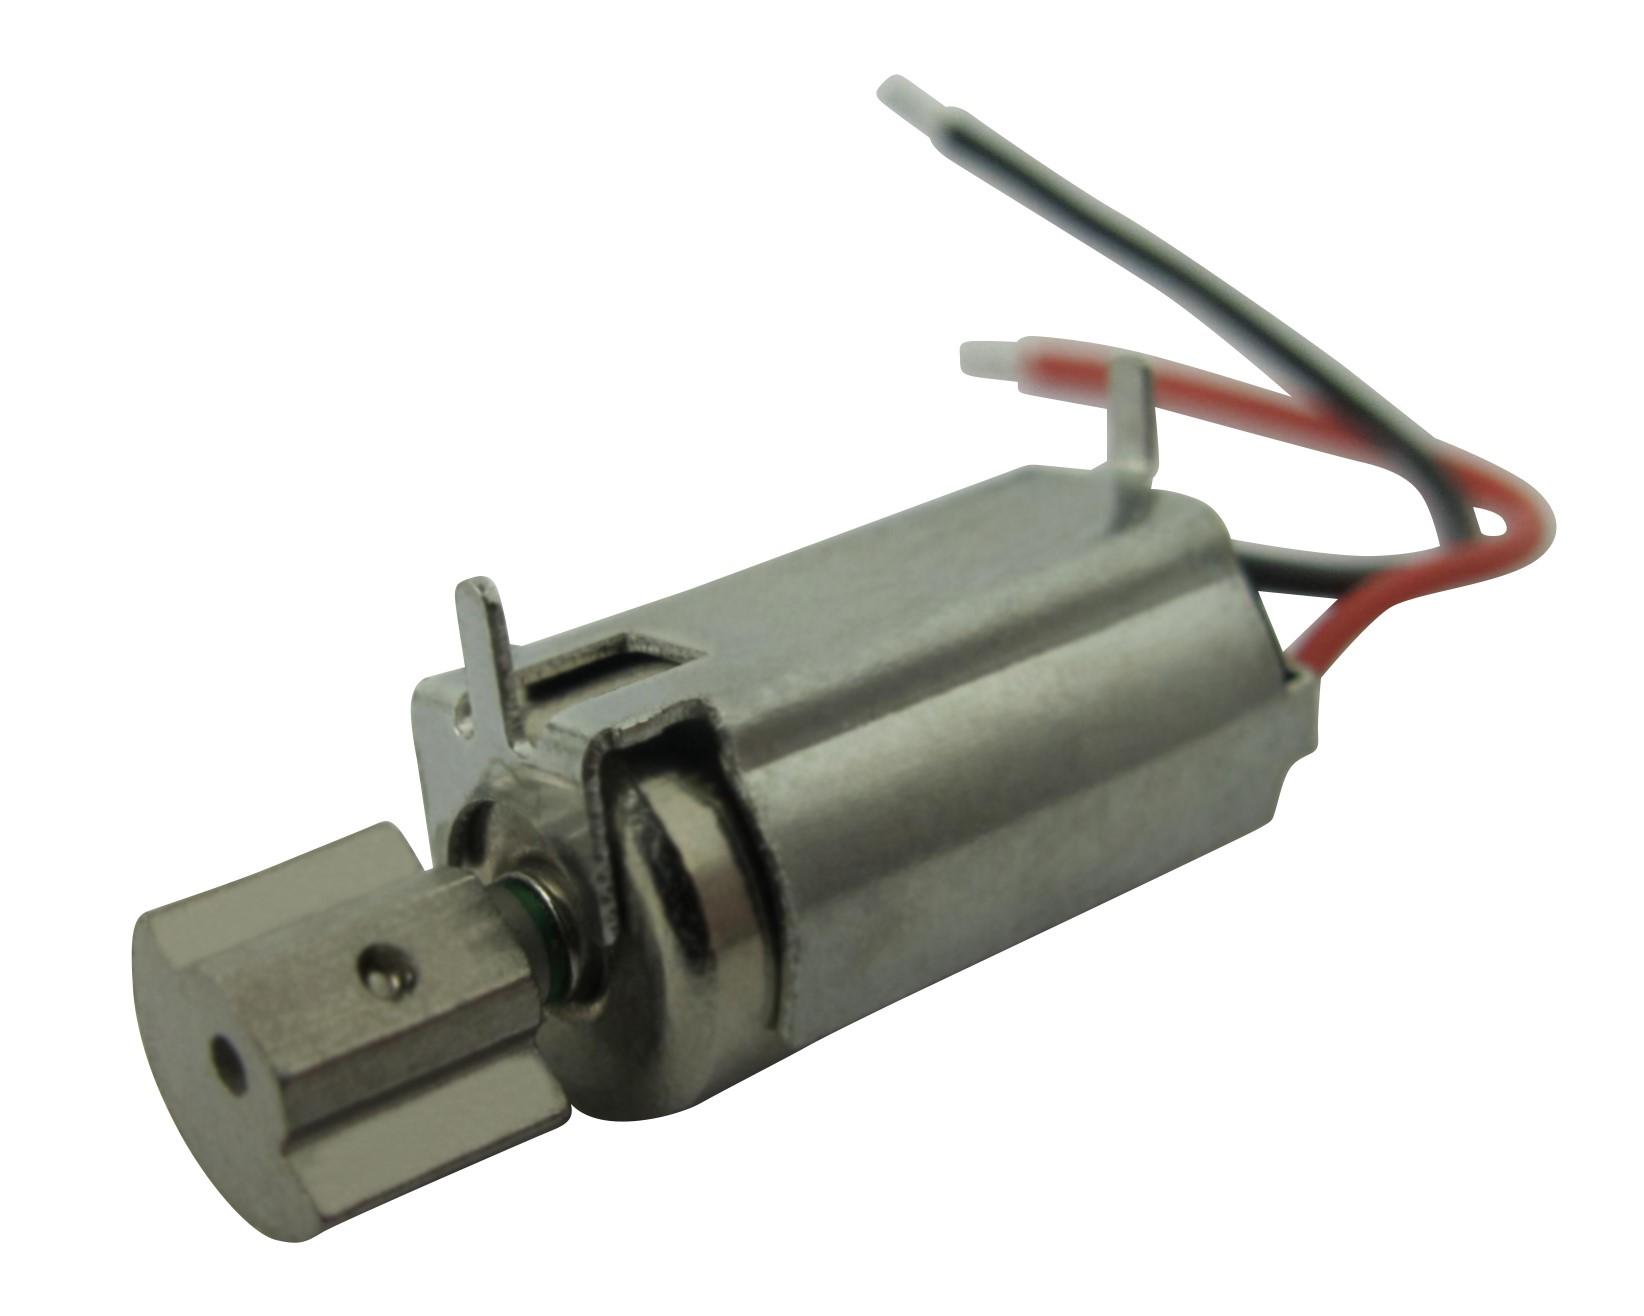 Z6DL2B0050441 Cylindrical Vibrator Motor